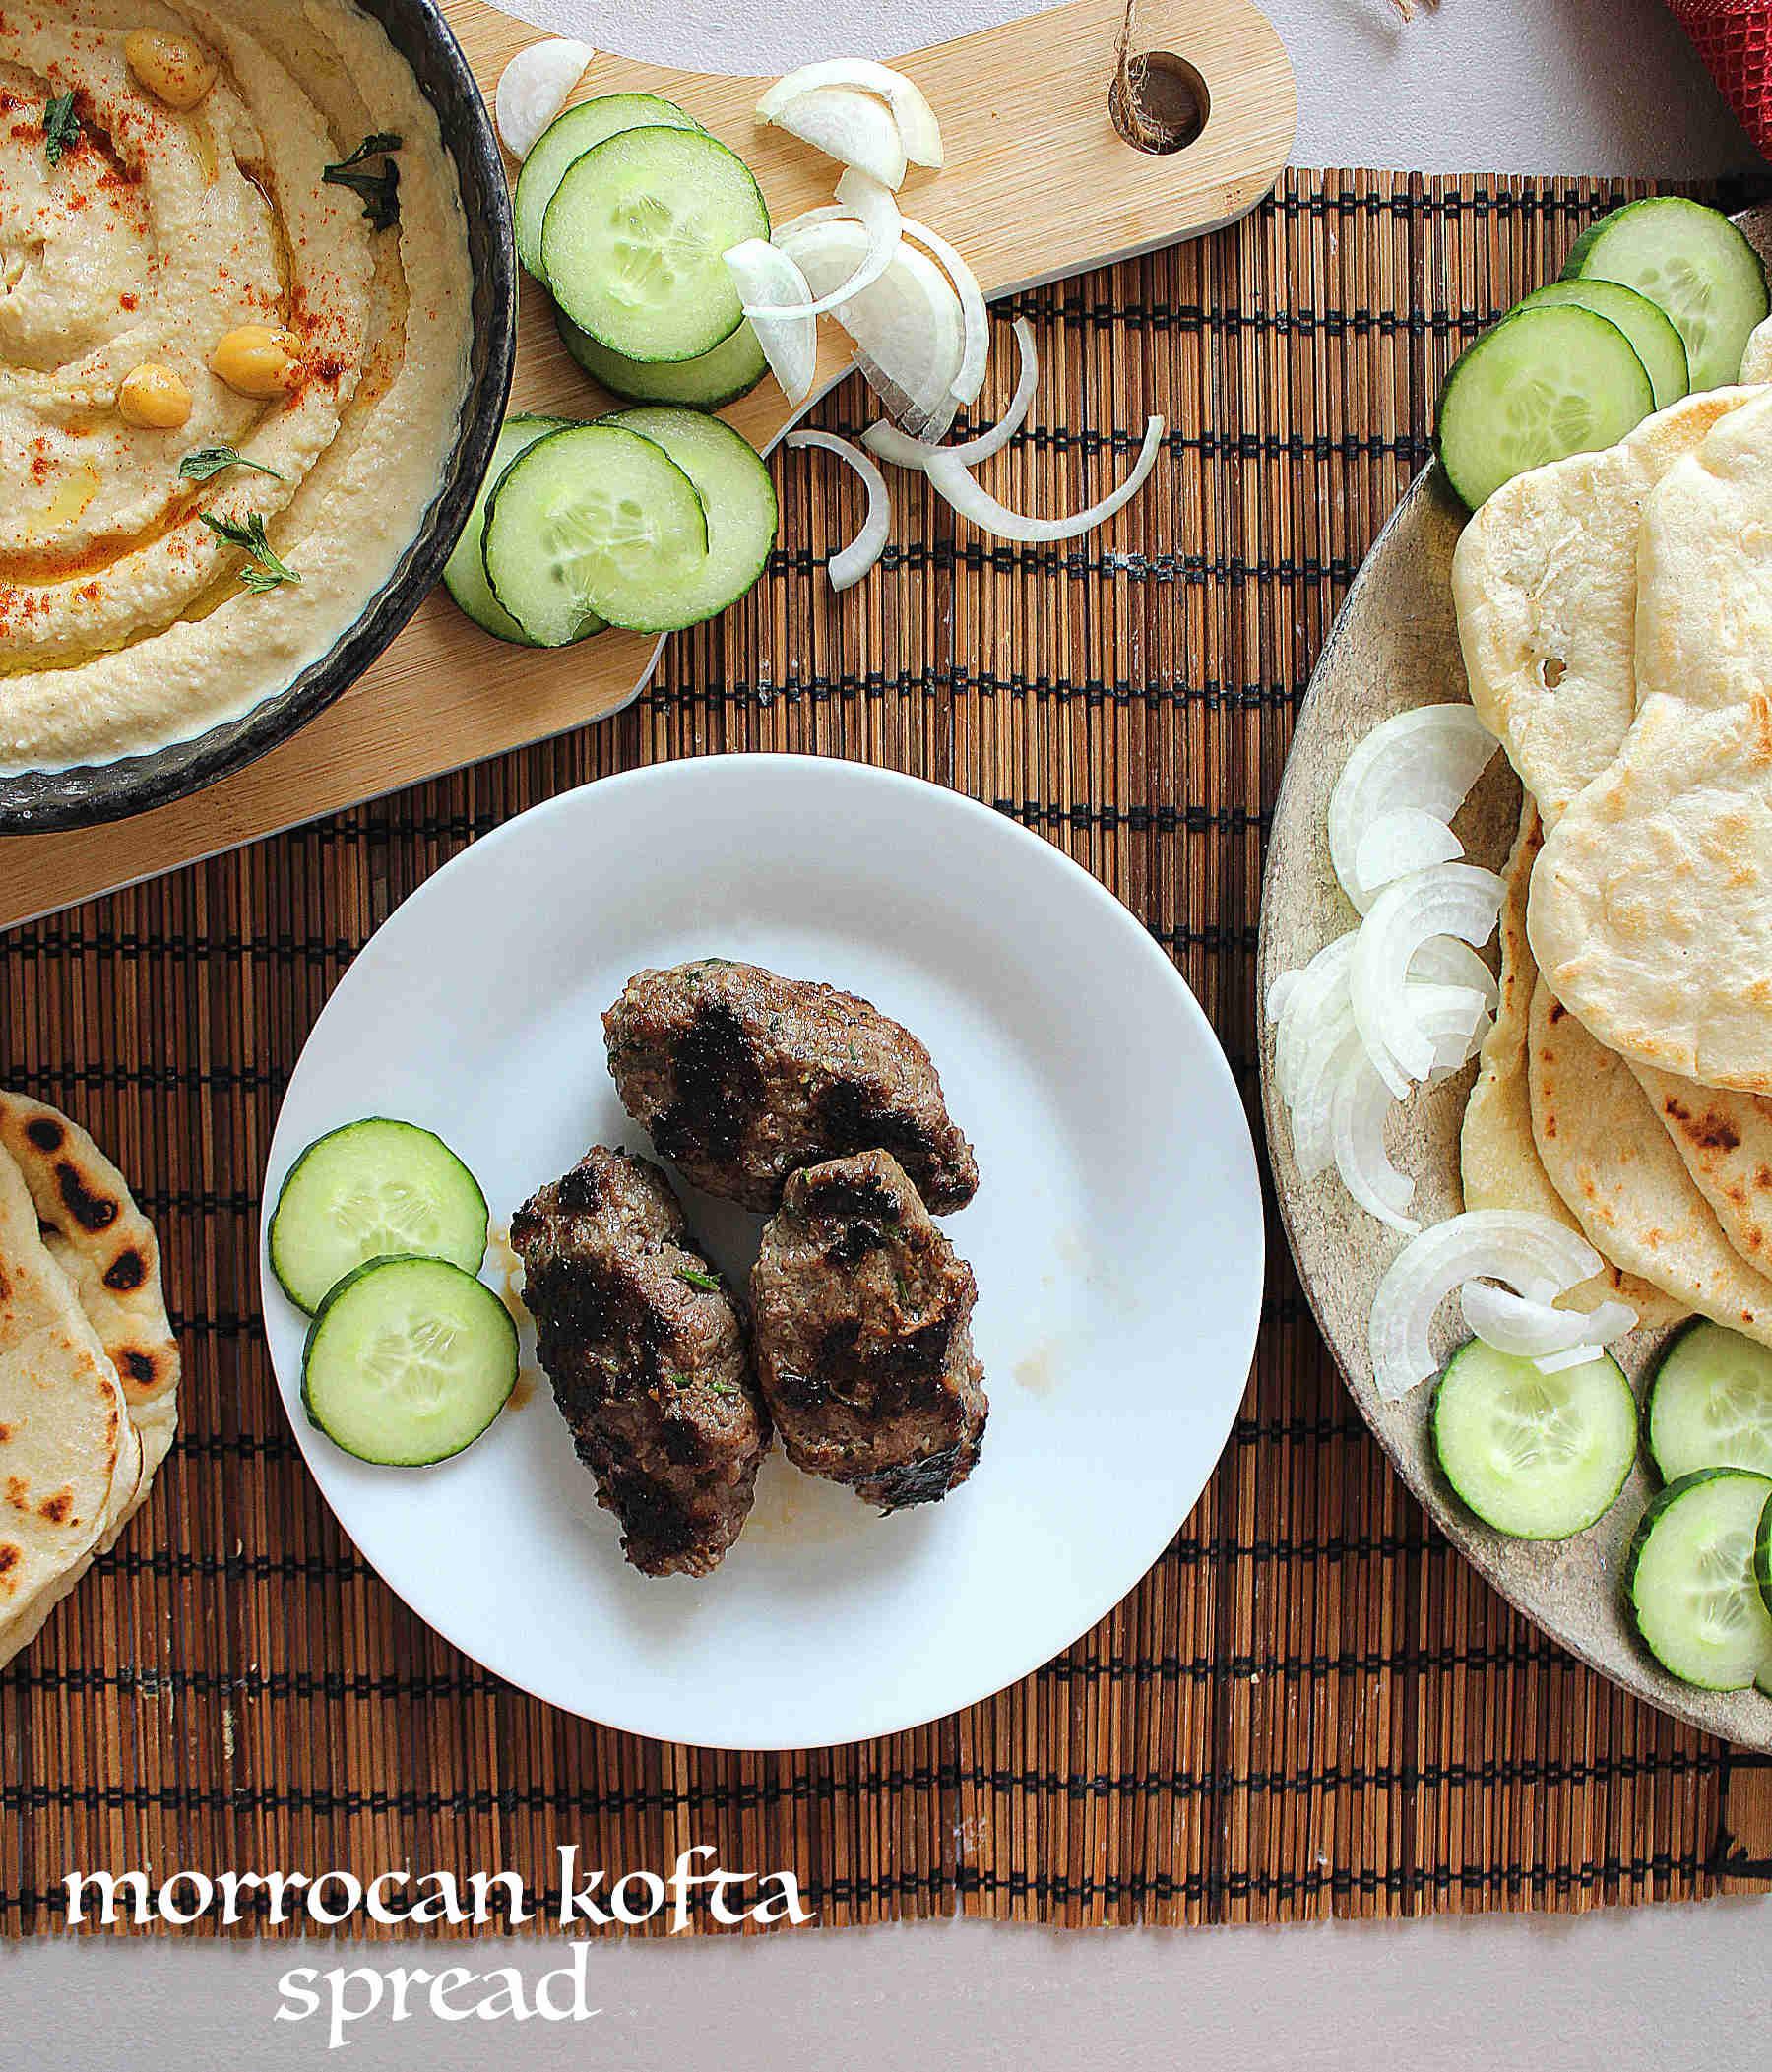 Moroccan koftah spread